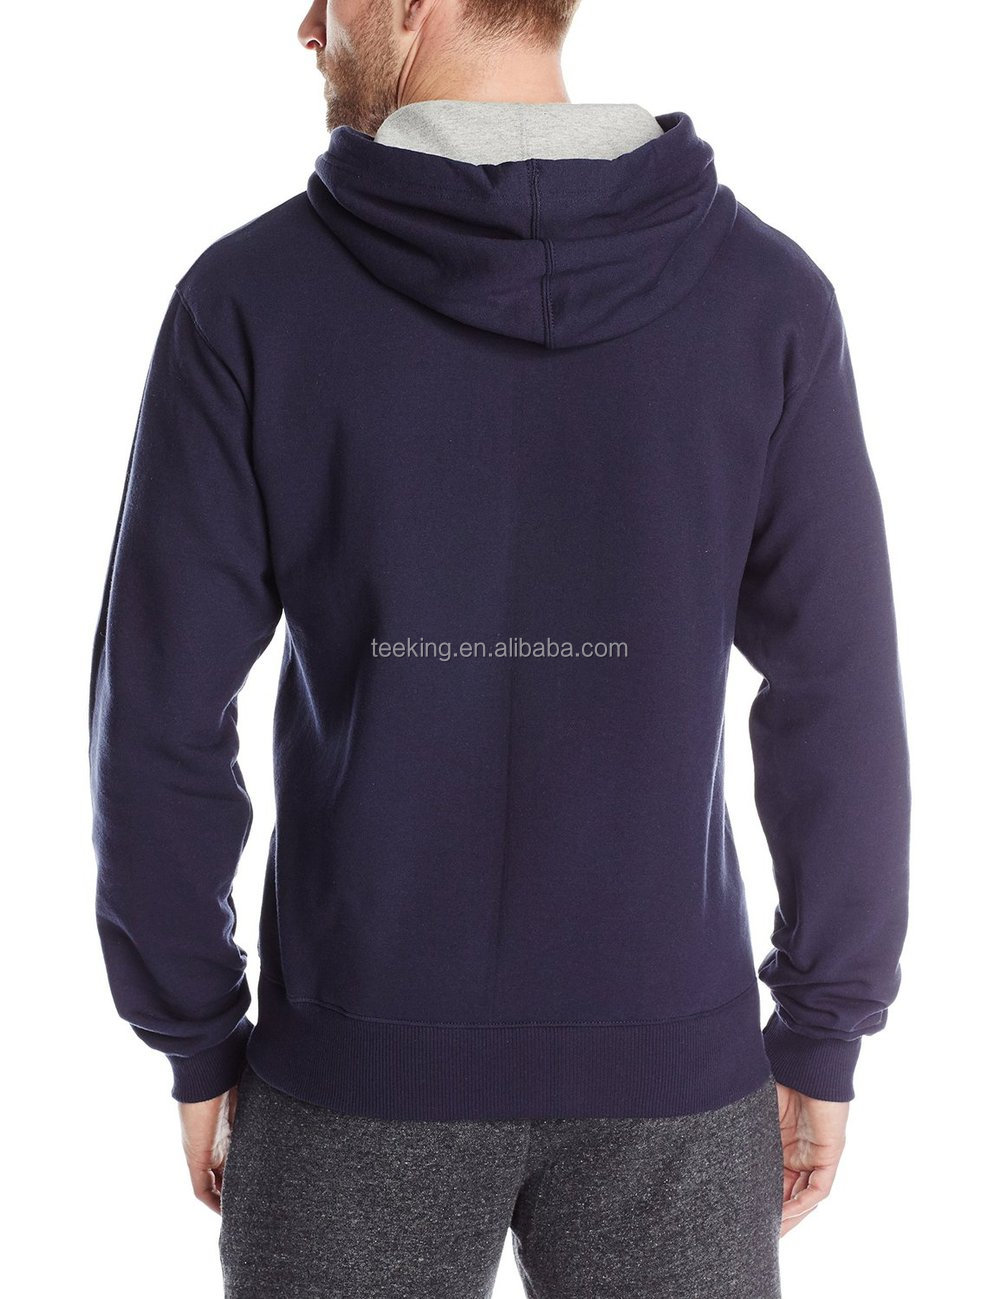 Customized hoodies cheap